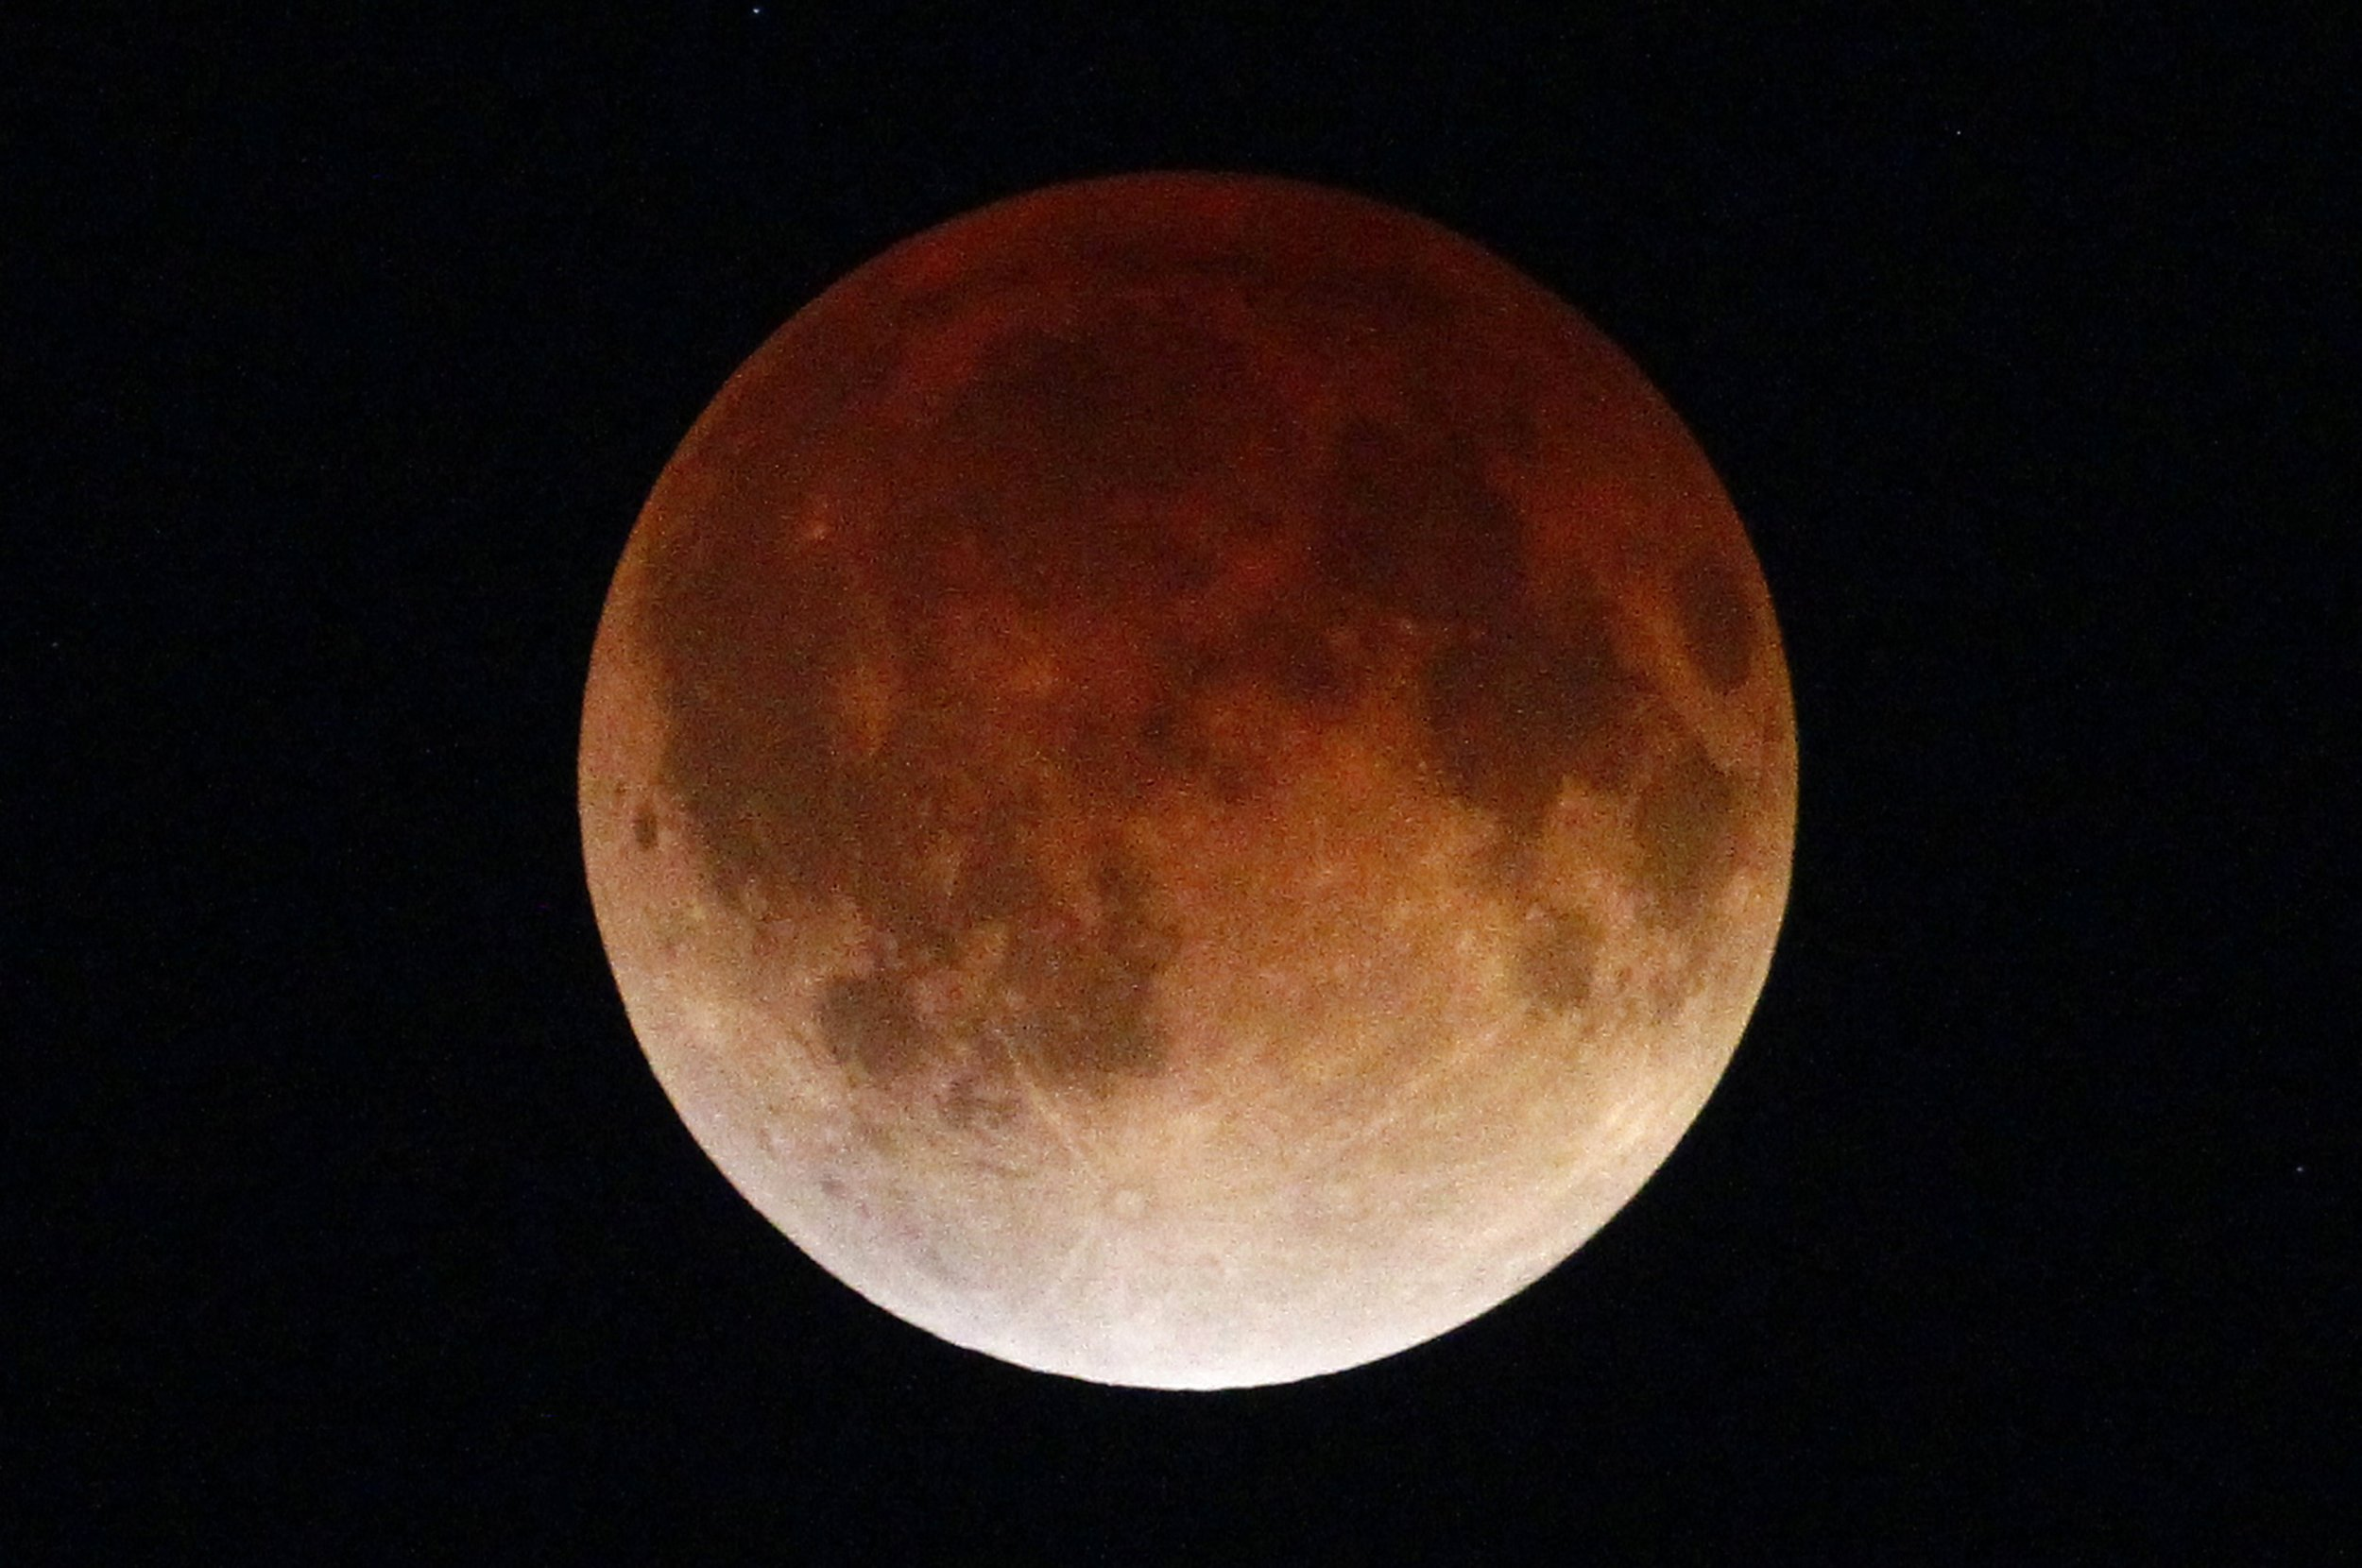 blood moon eclipse rain - photo #17